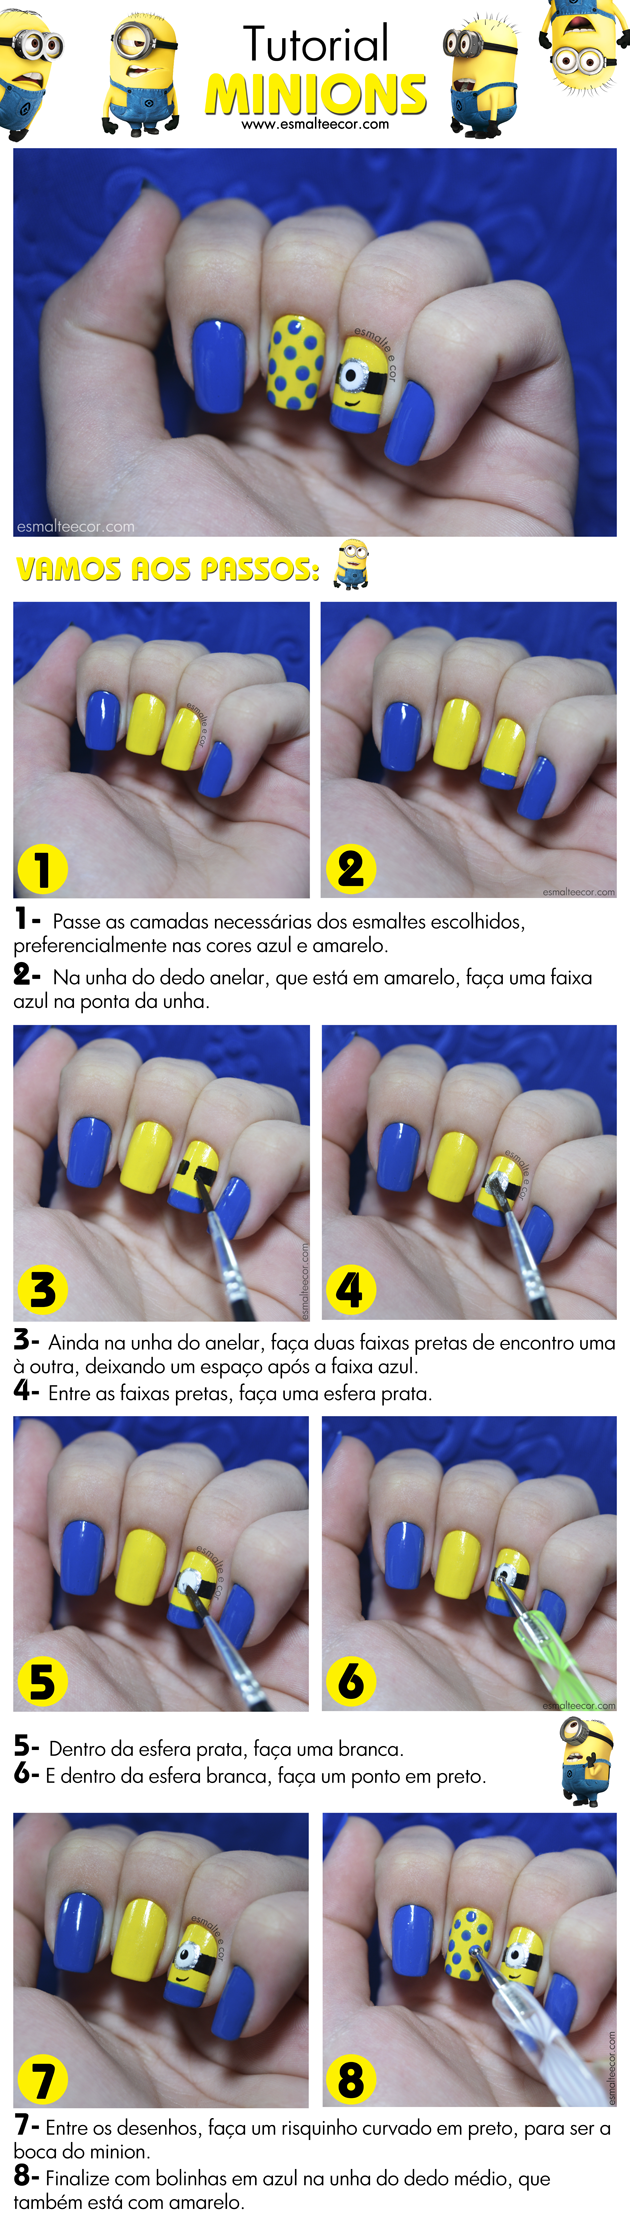 tutorial unha decorada, nail art com os minions passo a passo